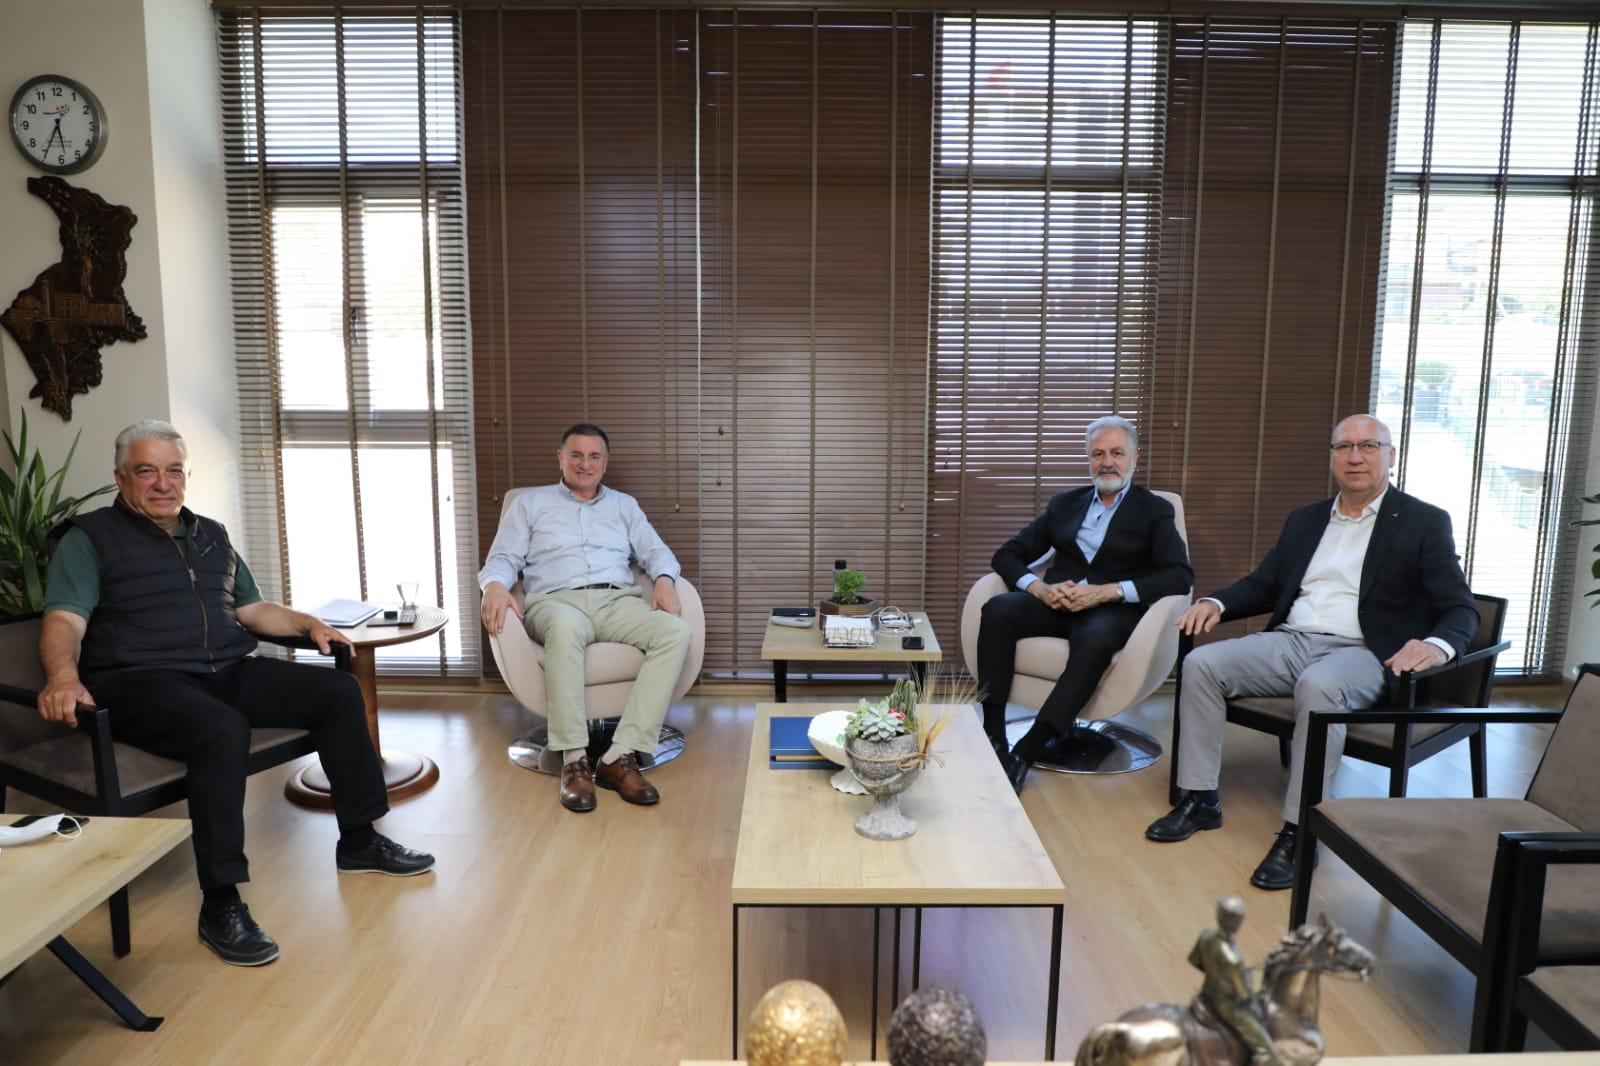 İTSO Yönetiminden HBB Başkanı Lütfü Savaş'a Nezaket Ziyareti